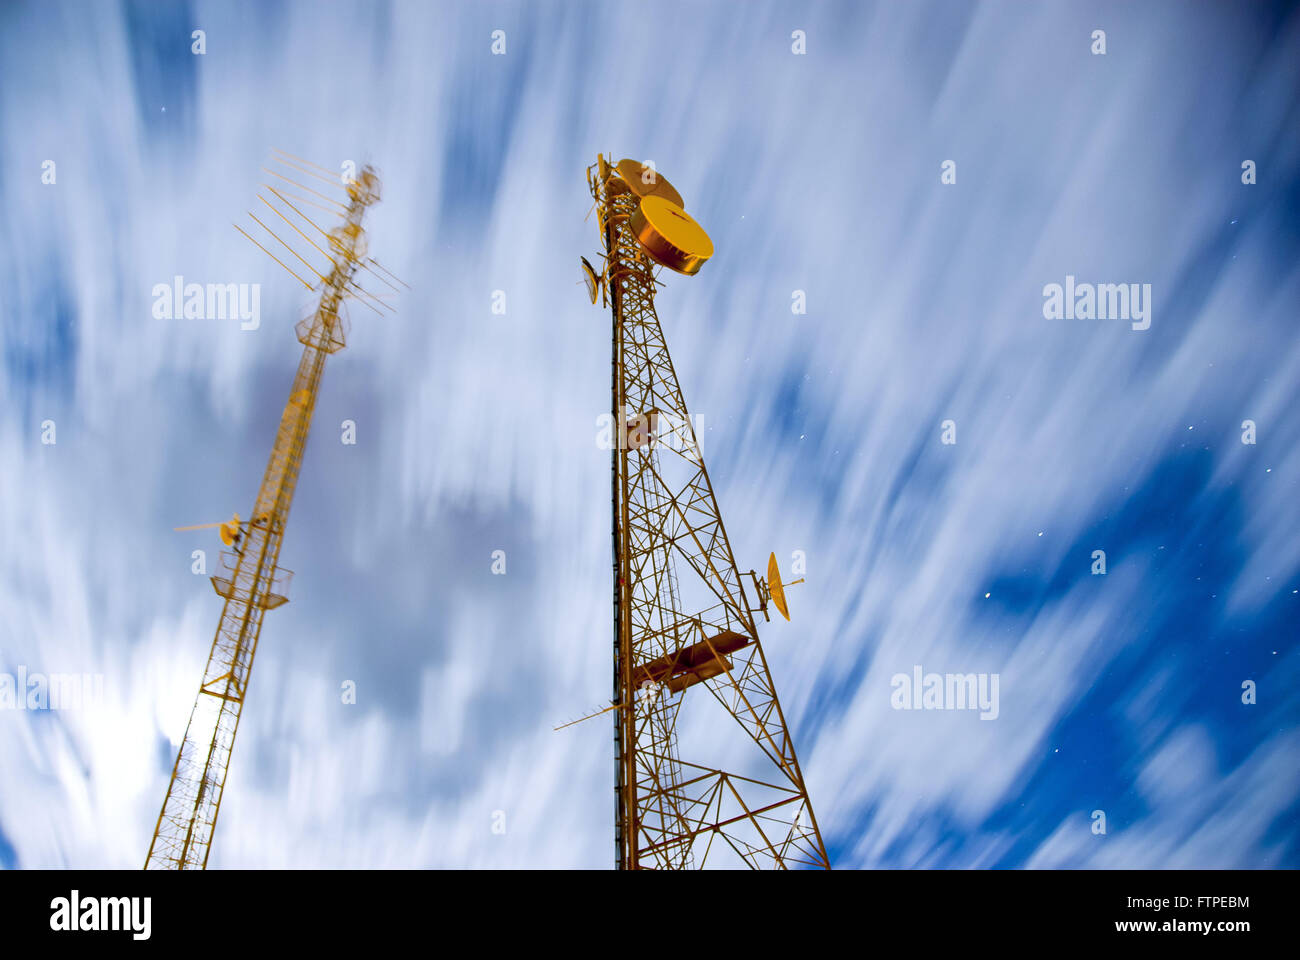 Telecommunications antennas City Straws - Stock Image